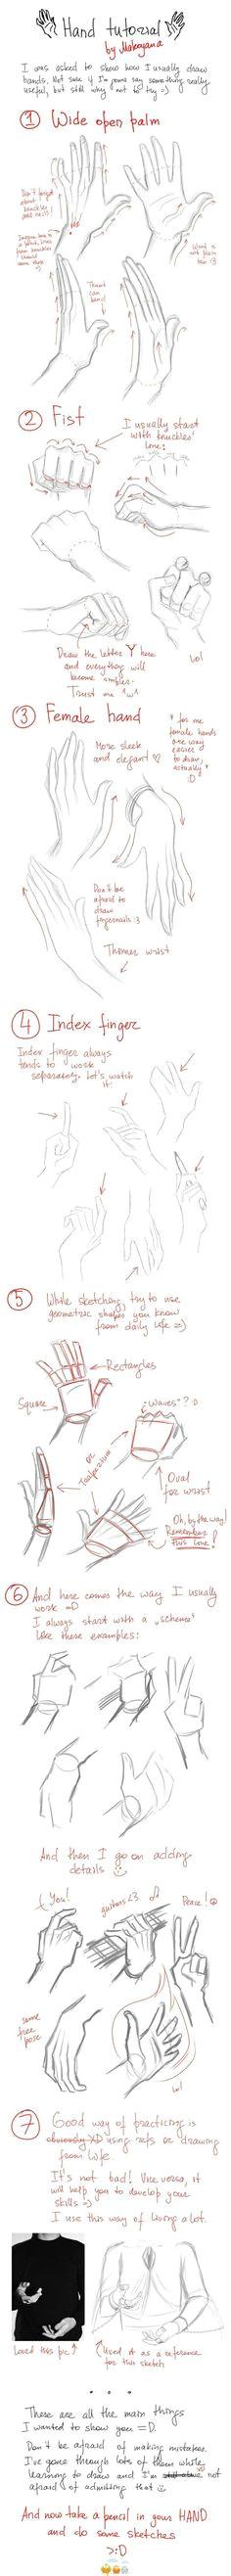 inspiring hands via paula parker sketchy at best bloglovin com wendy schultz